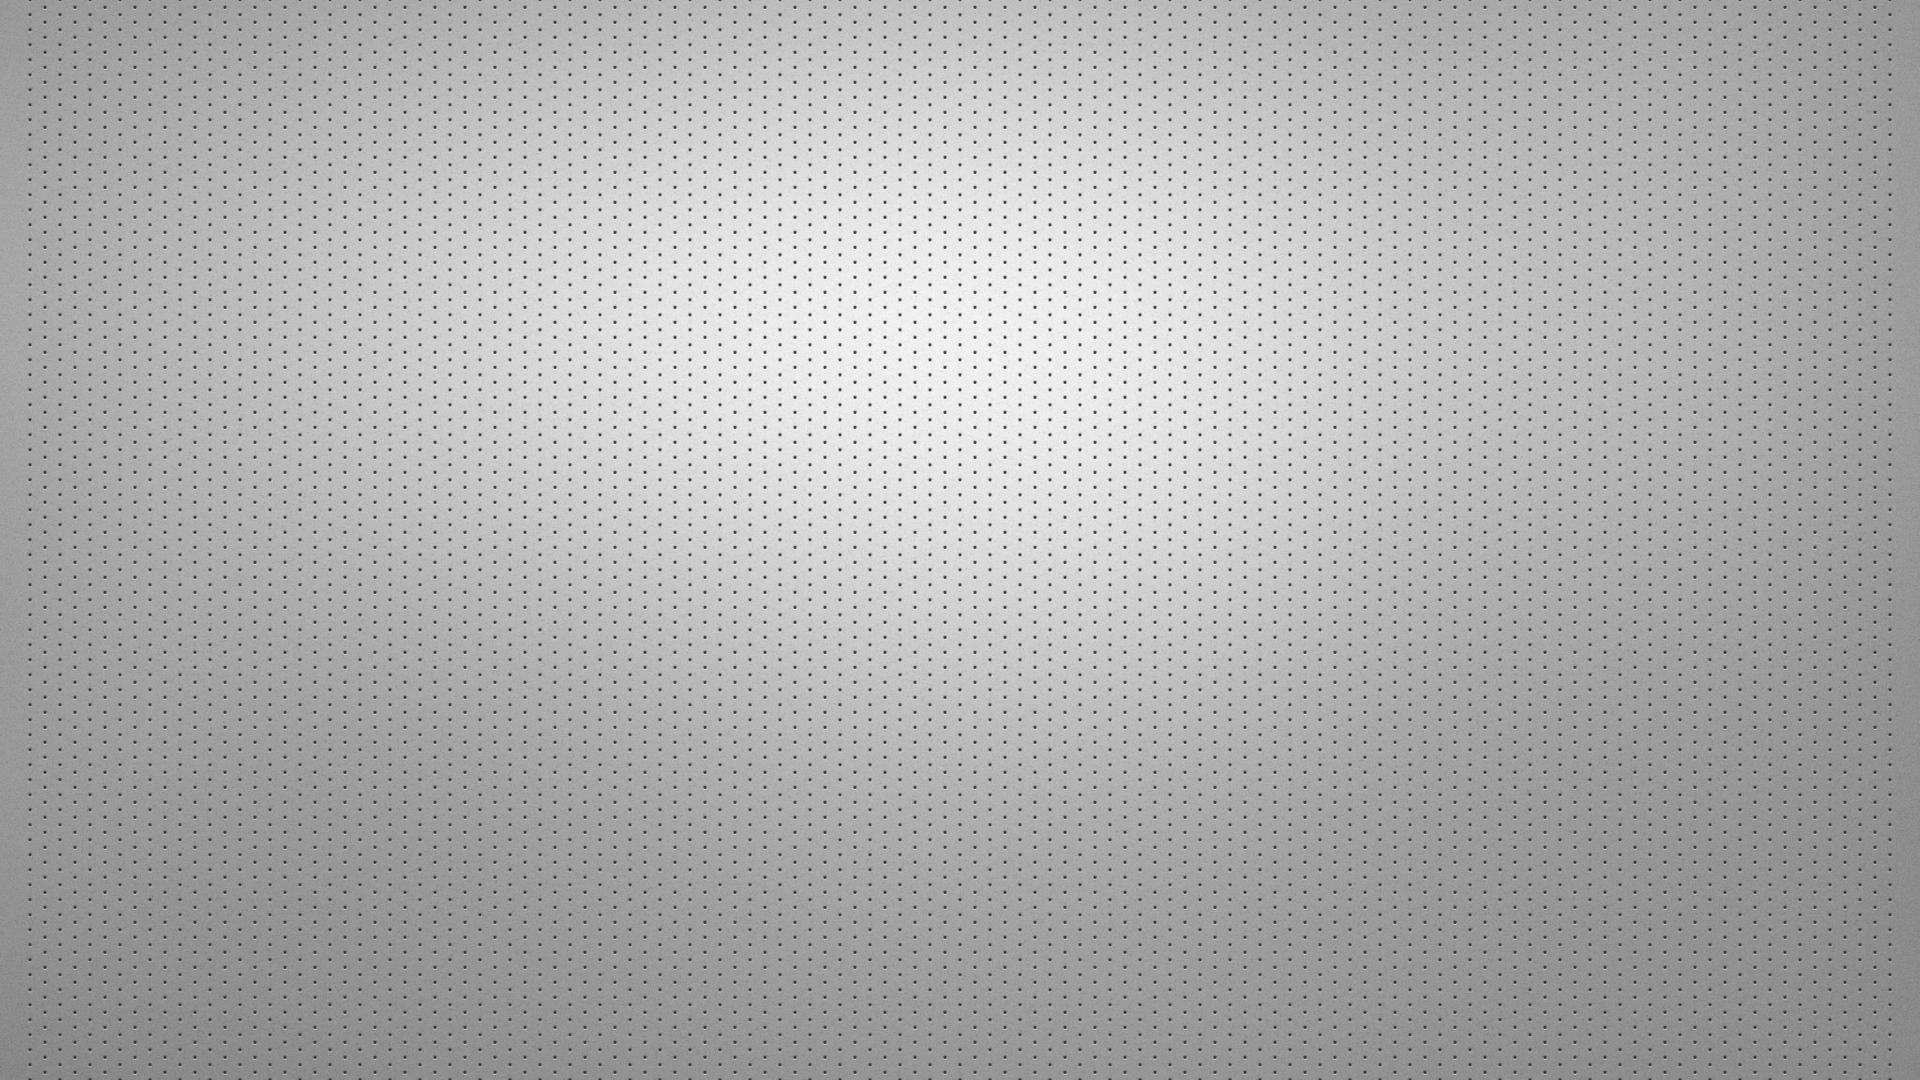 40 Silver Hd Wallpaper On Wallpapersafari